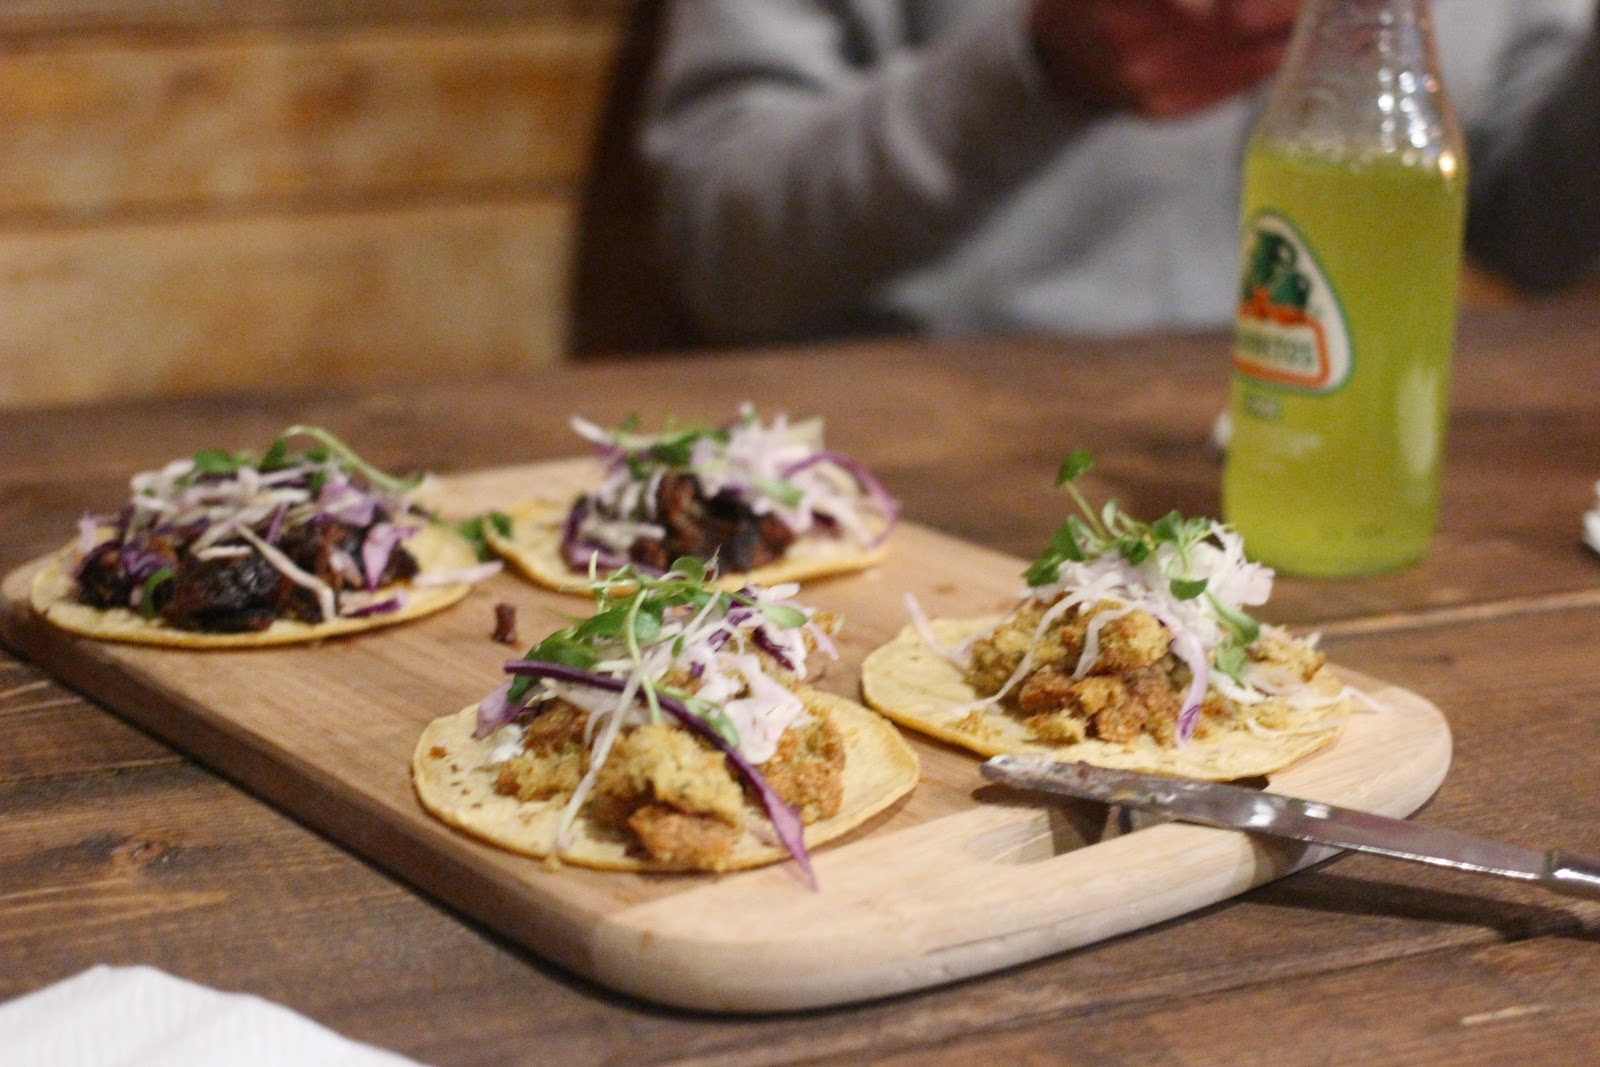 Best Tex-Mex Restaurants in Dallas Serving Tacos